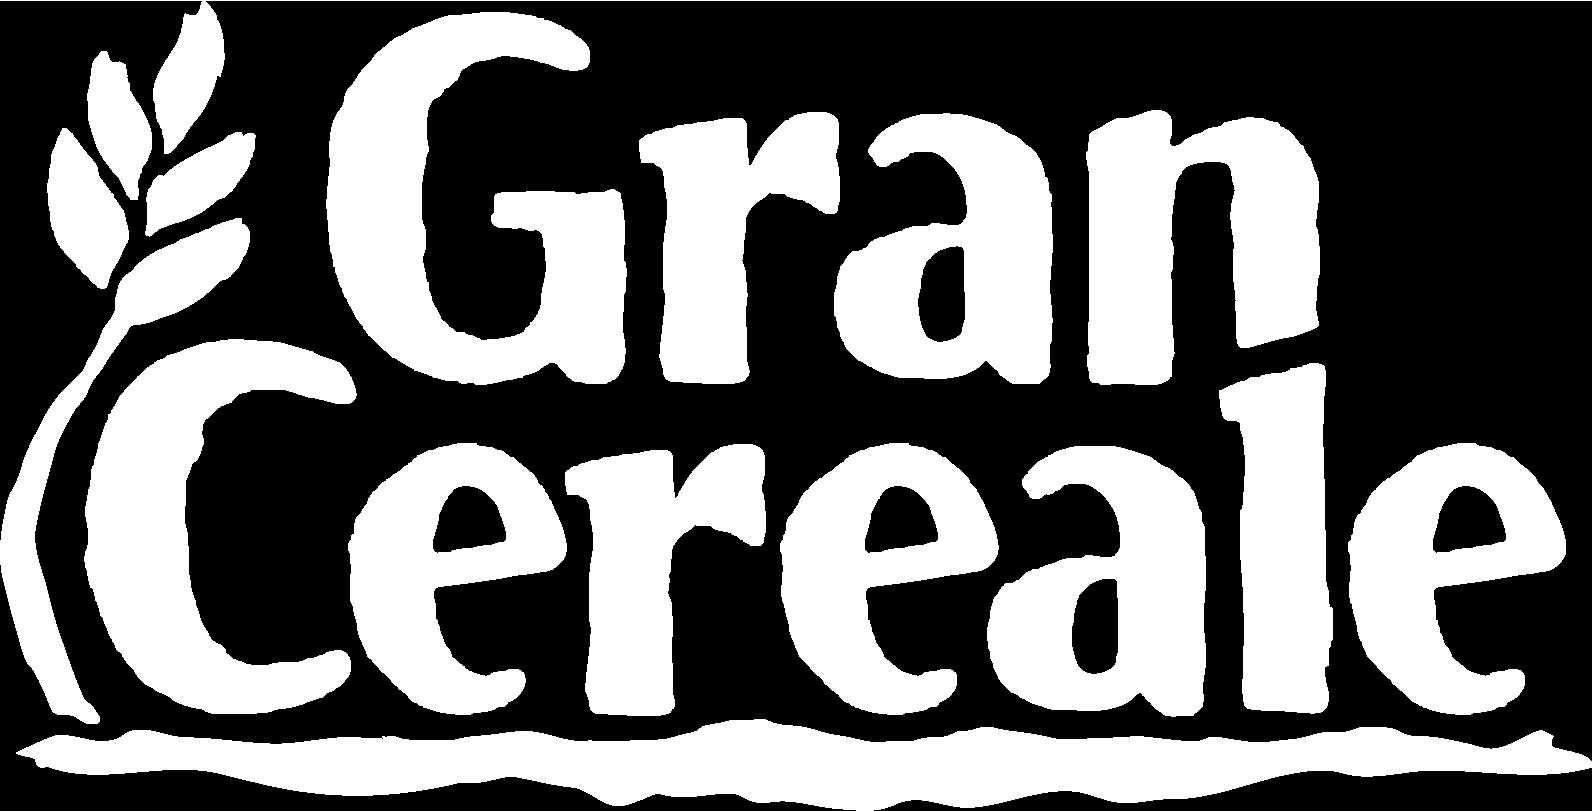 GranCereale - η δυναμη μασ ειναι η φυση